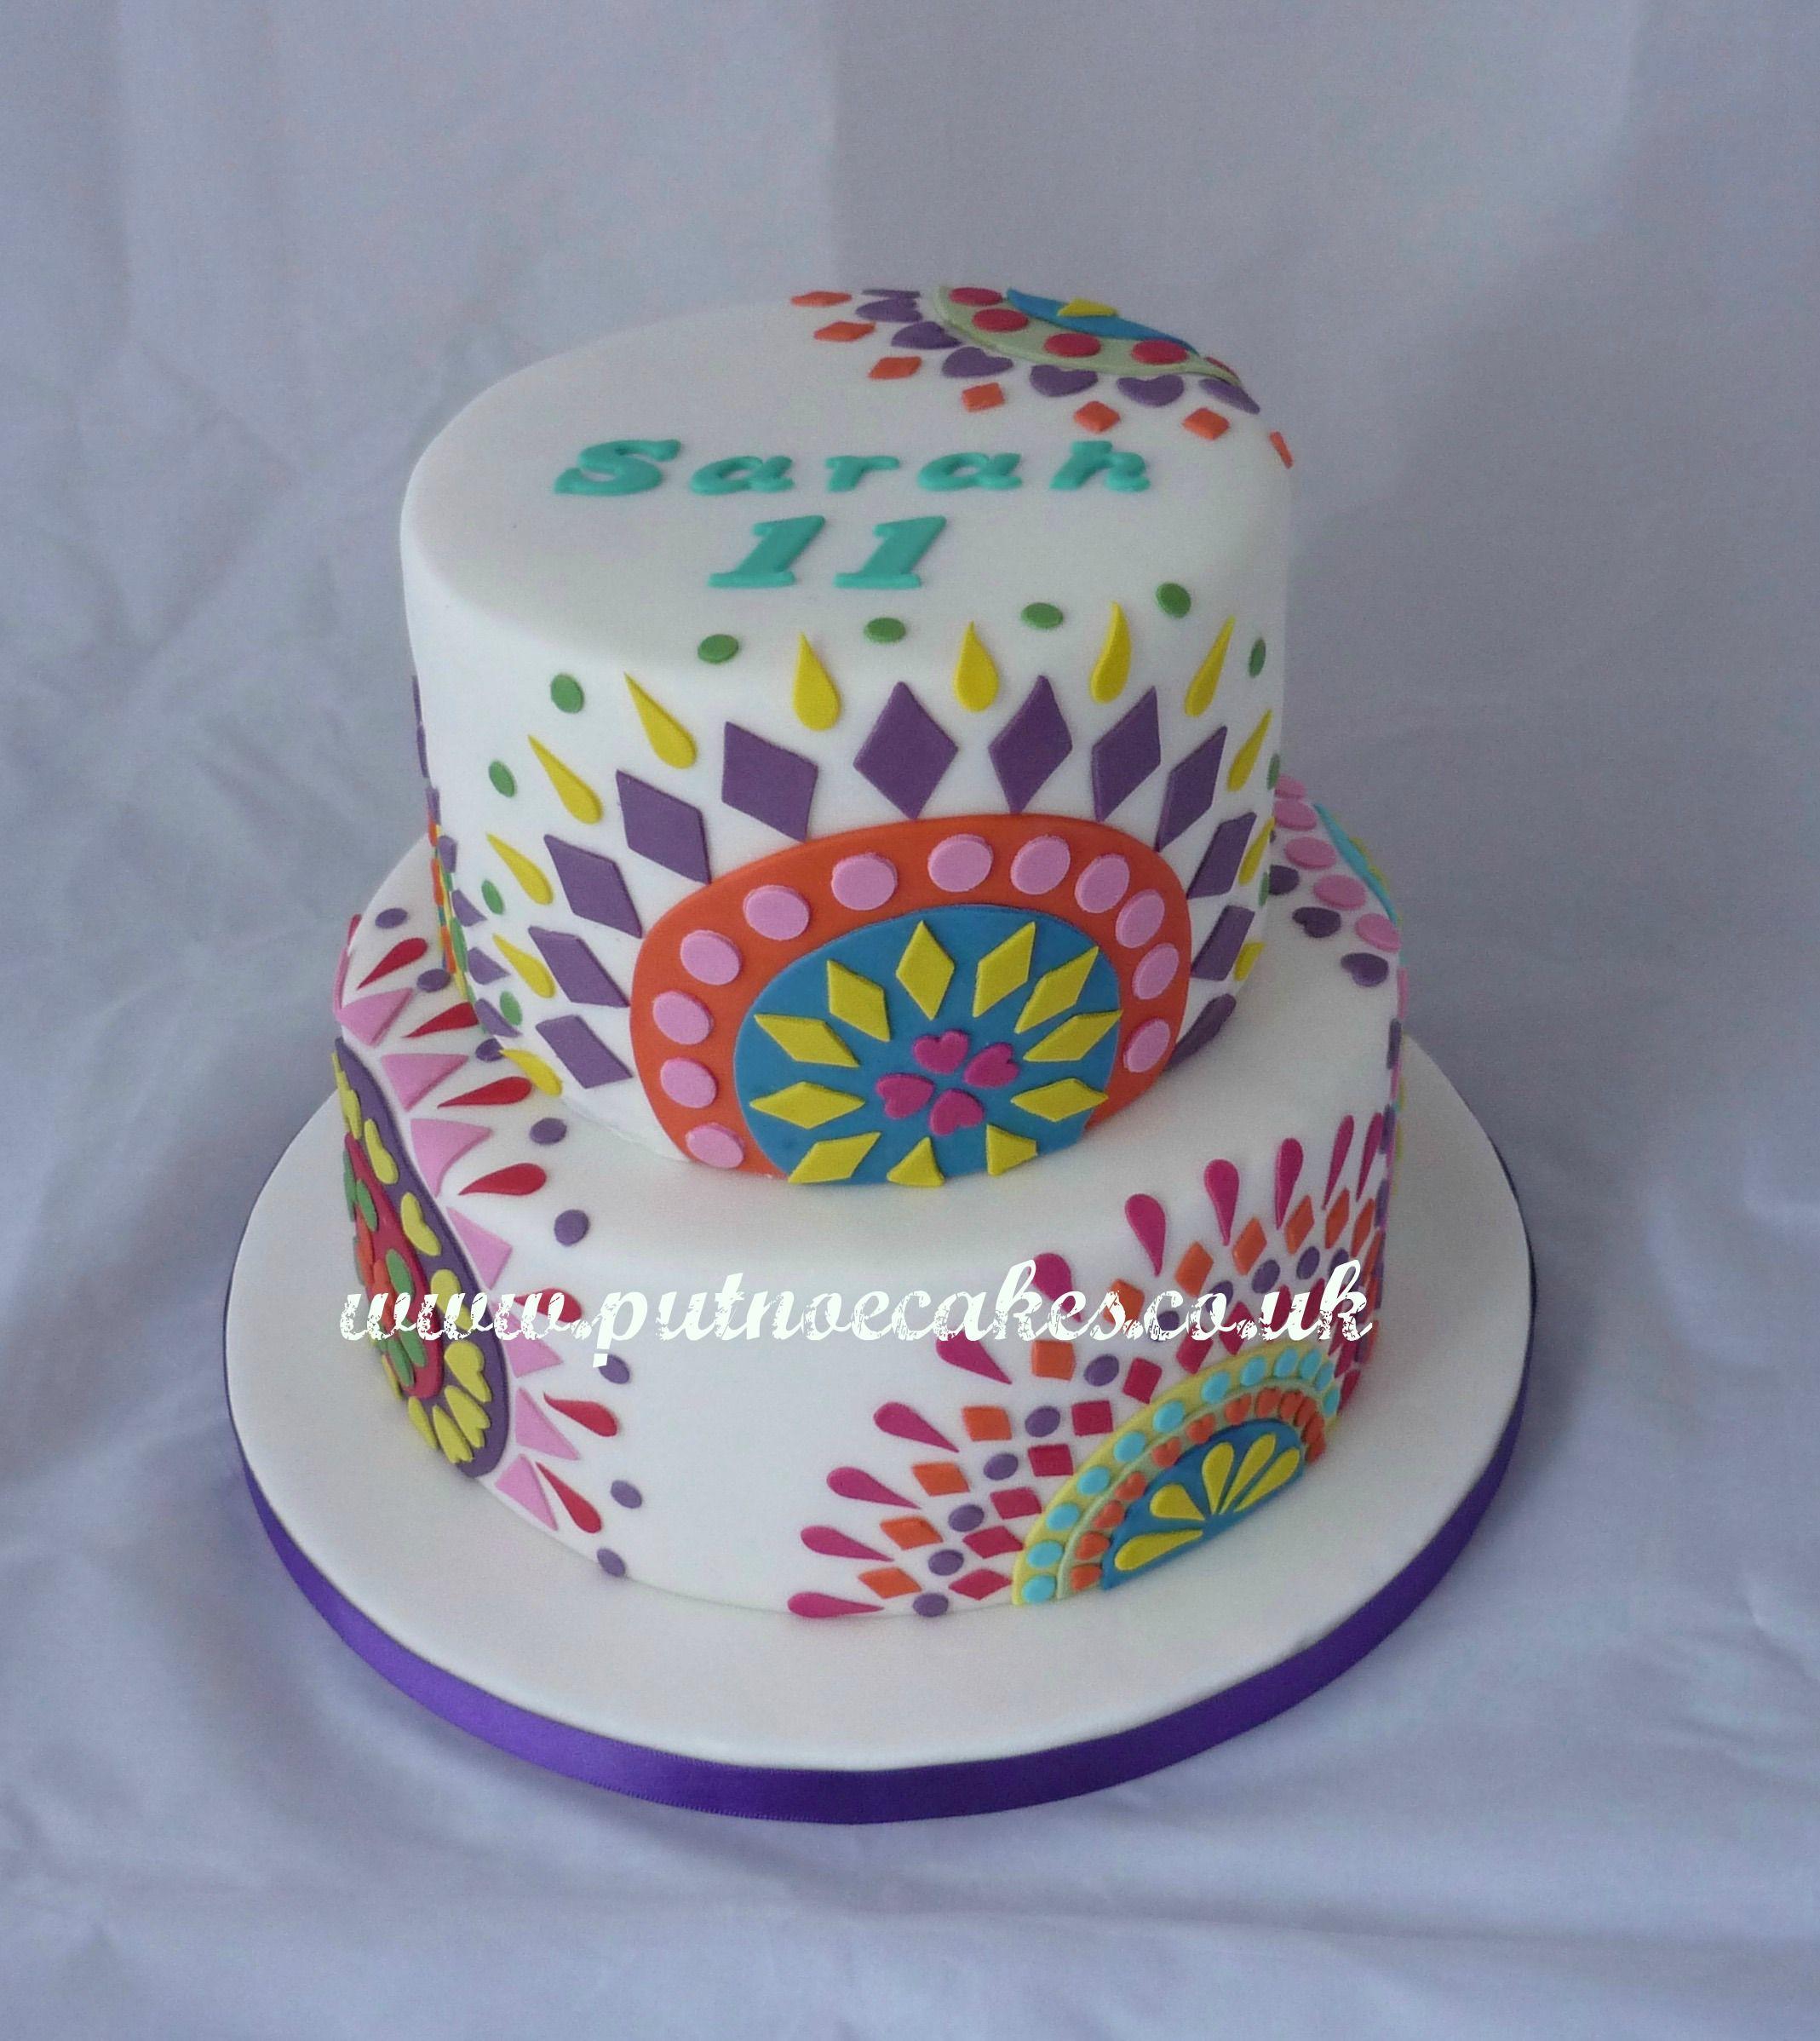 Desigual designer cake lots of colour and fun to make pasta